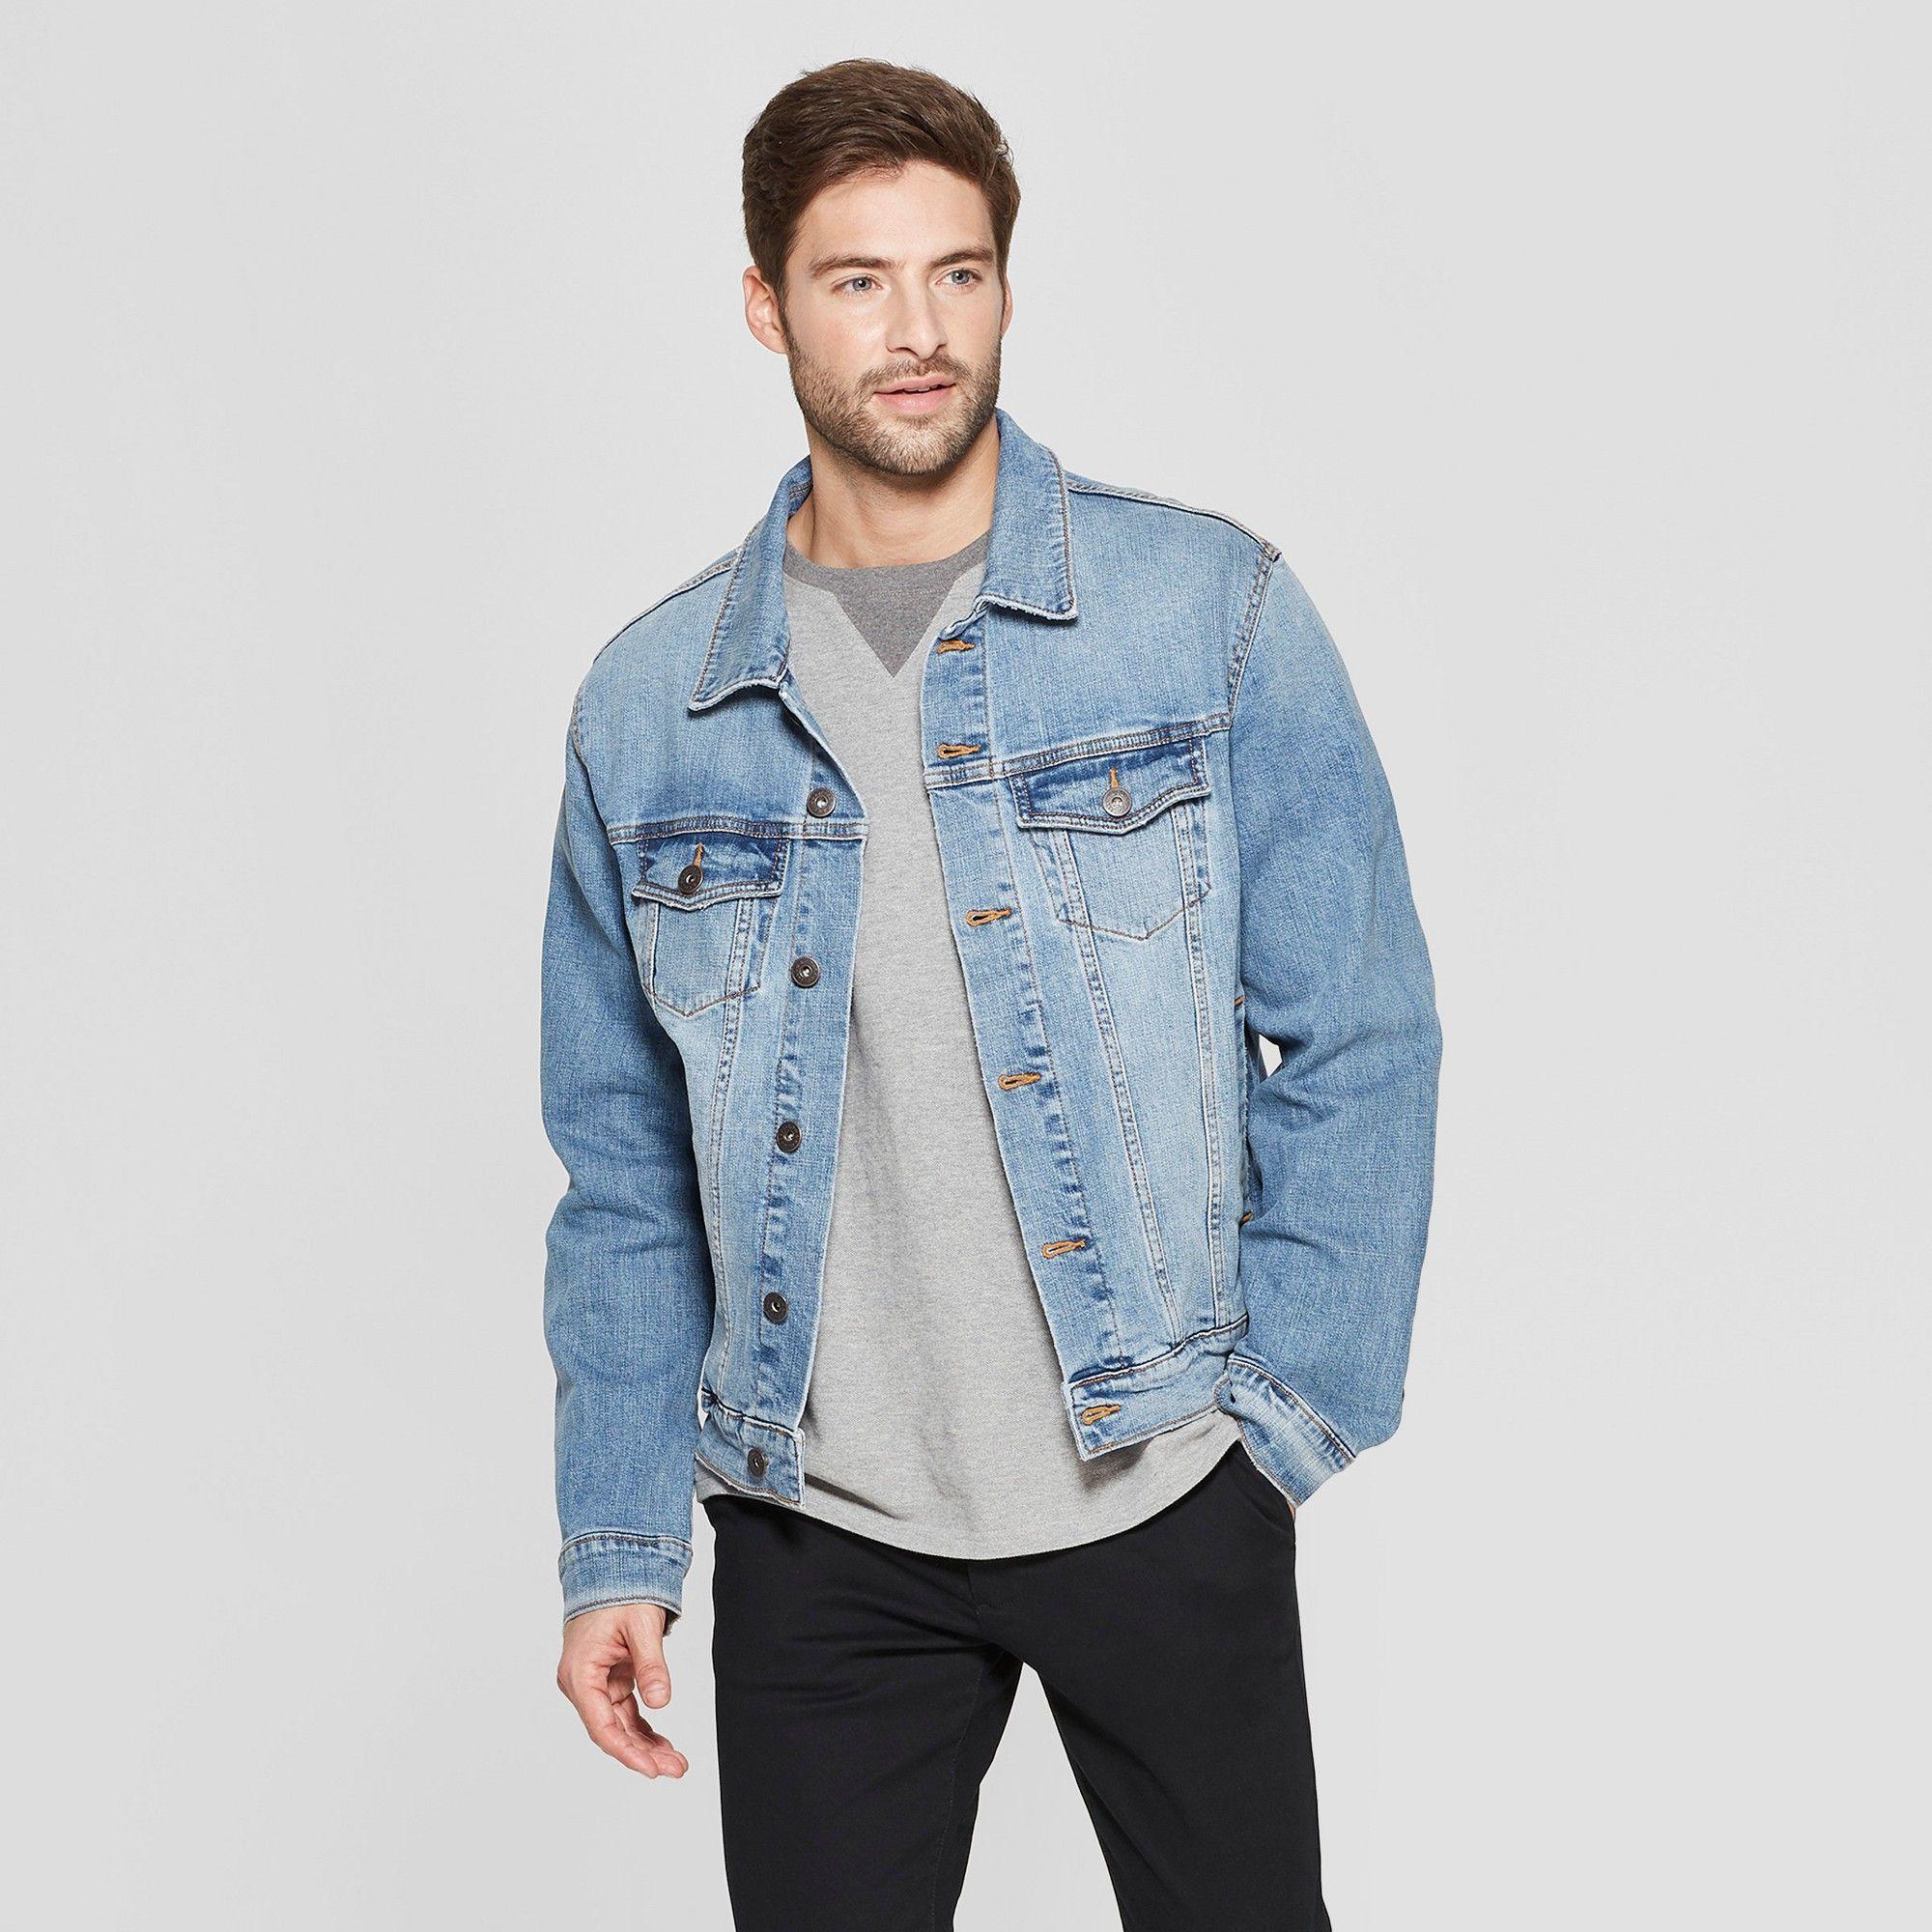 Pin By Eli Rylie On Men S Style Light Wash Denim Jacket Denim Jacket Men Jacket Outfits [ 2000 x 2000 Pixel ]